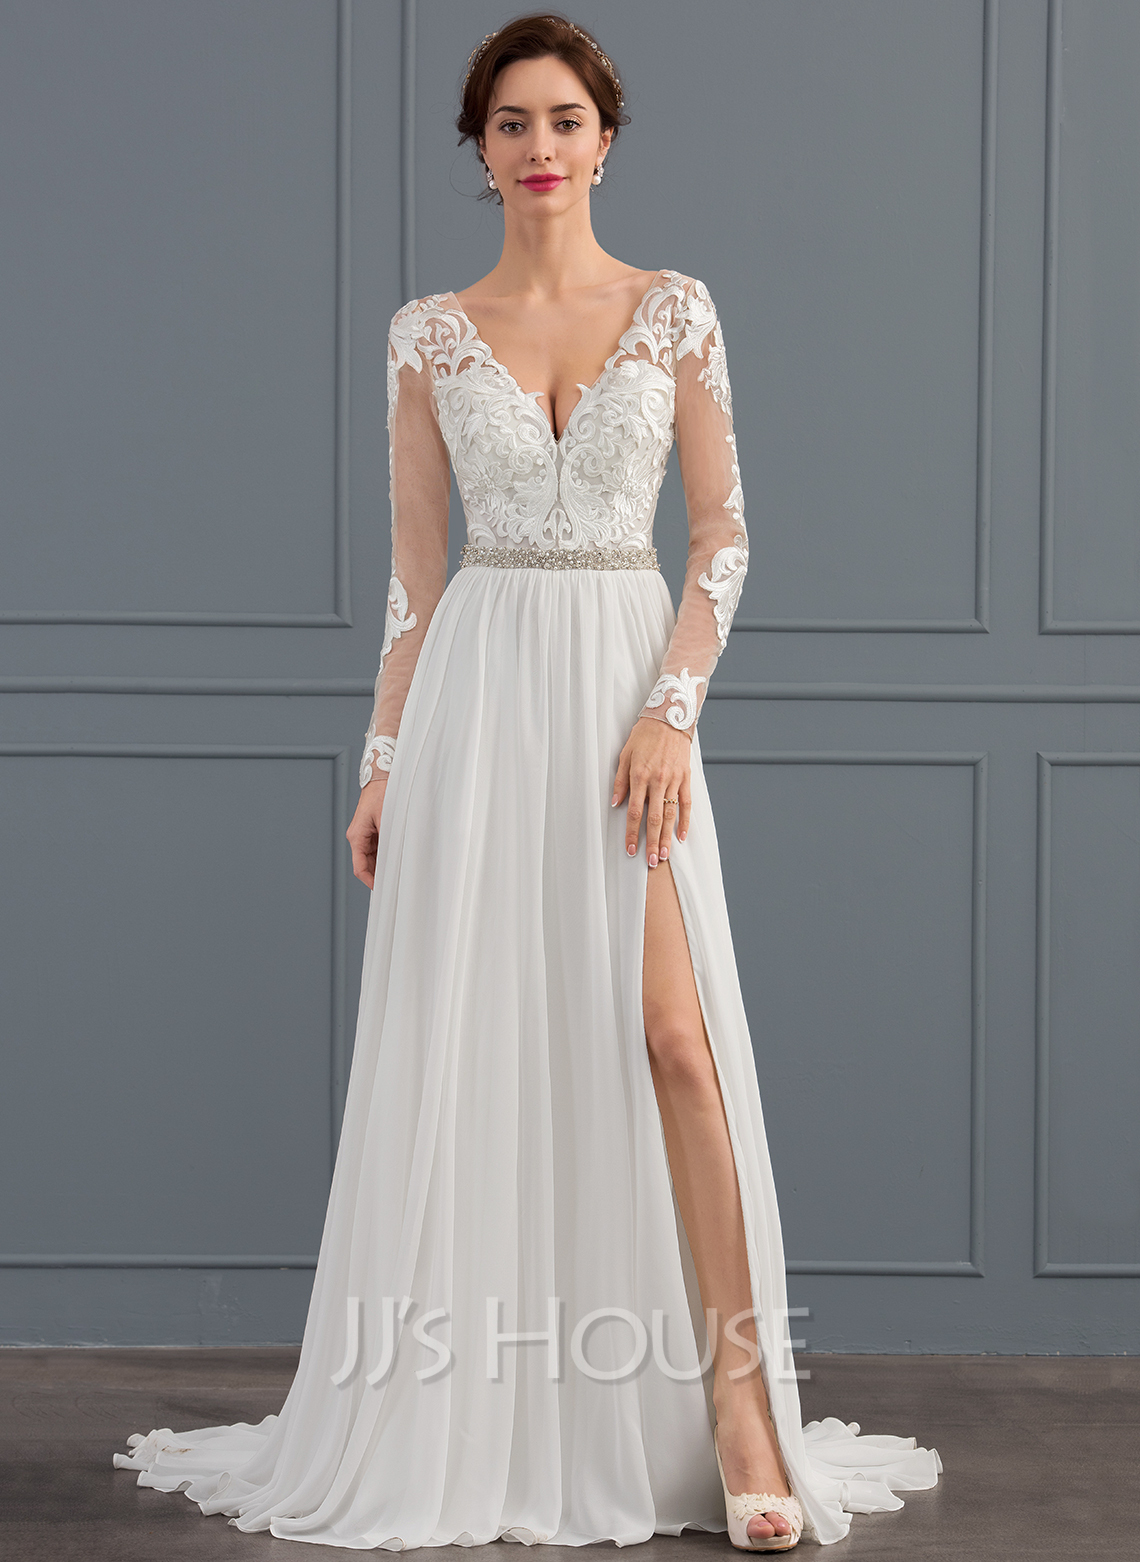 A-Line/Princess V-neck Sweep Train Chiffon Wedding Dress With Beading Sequins Split Front